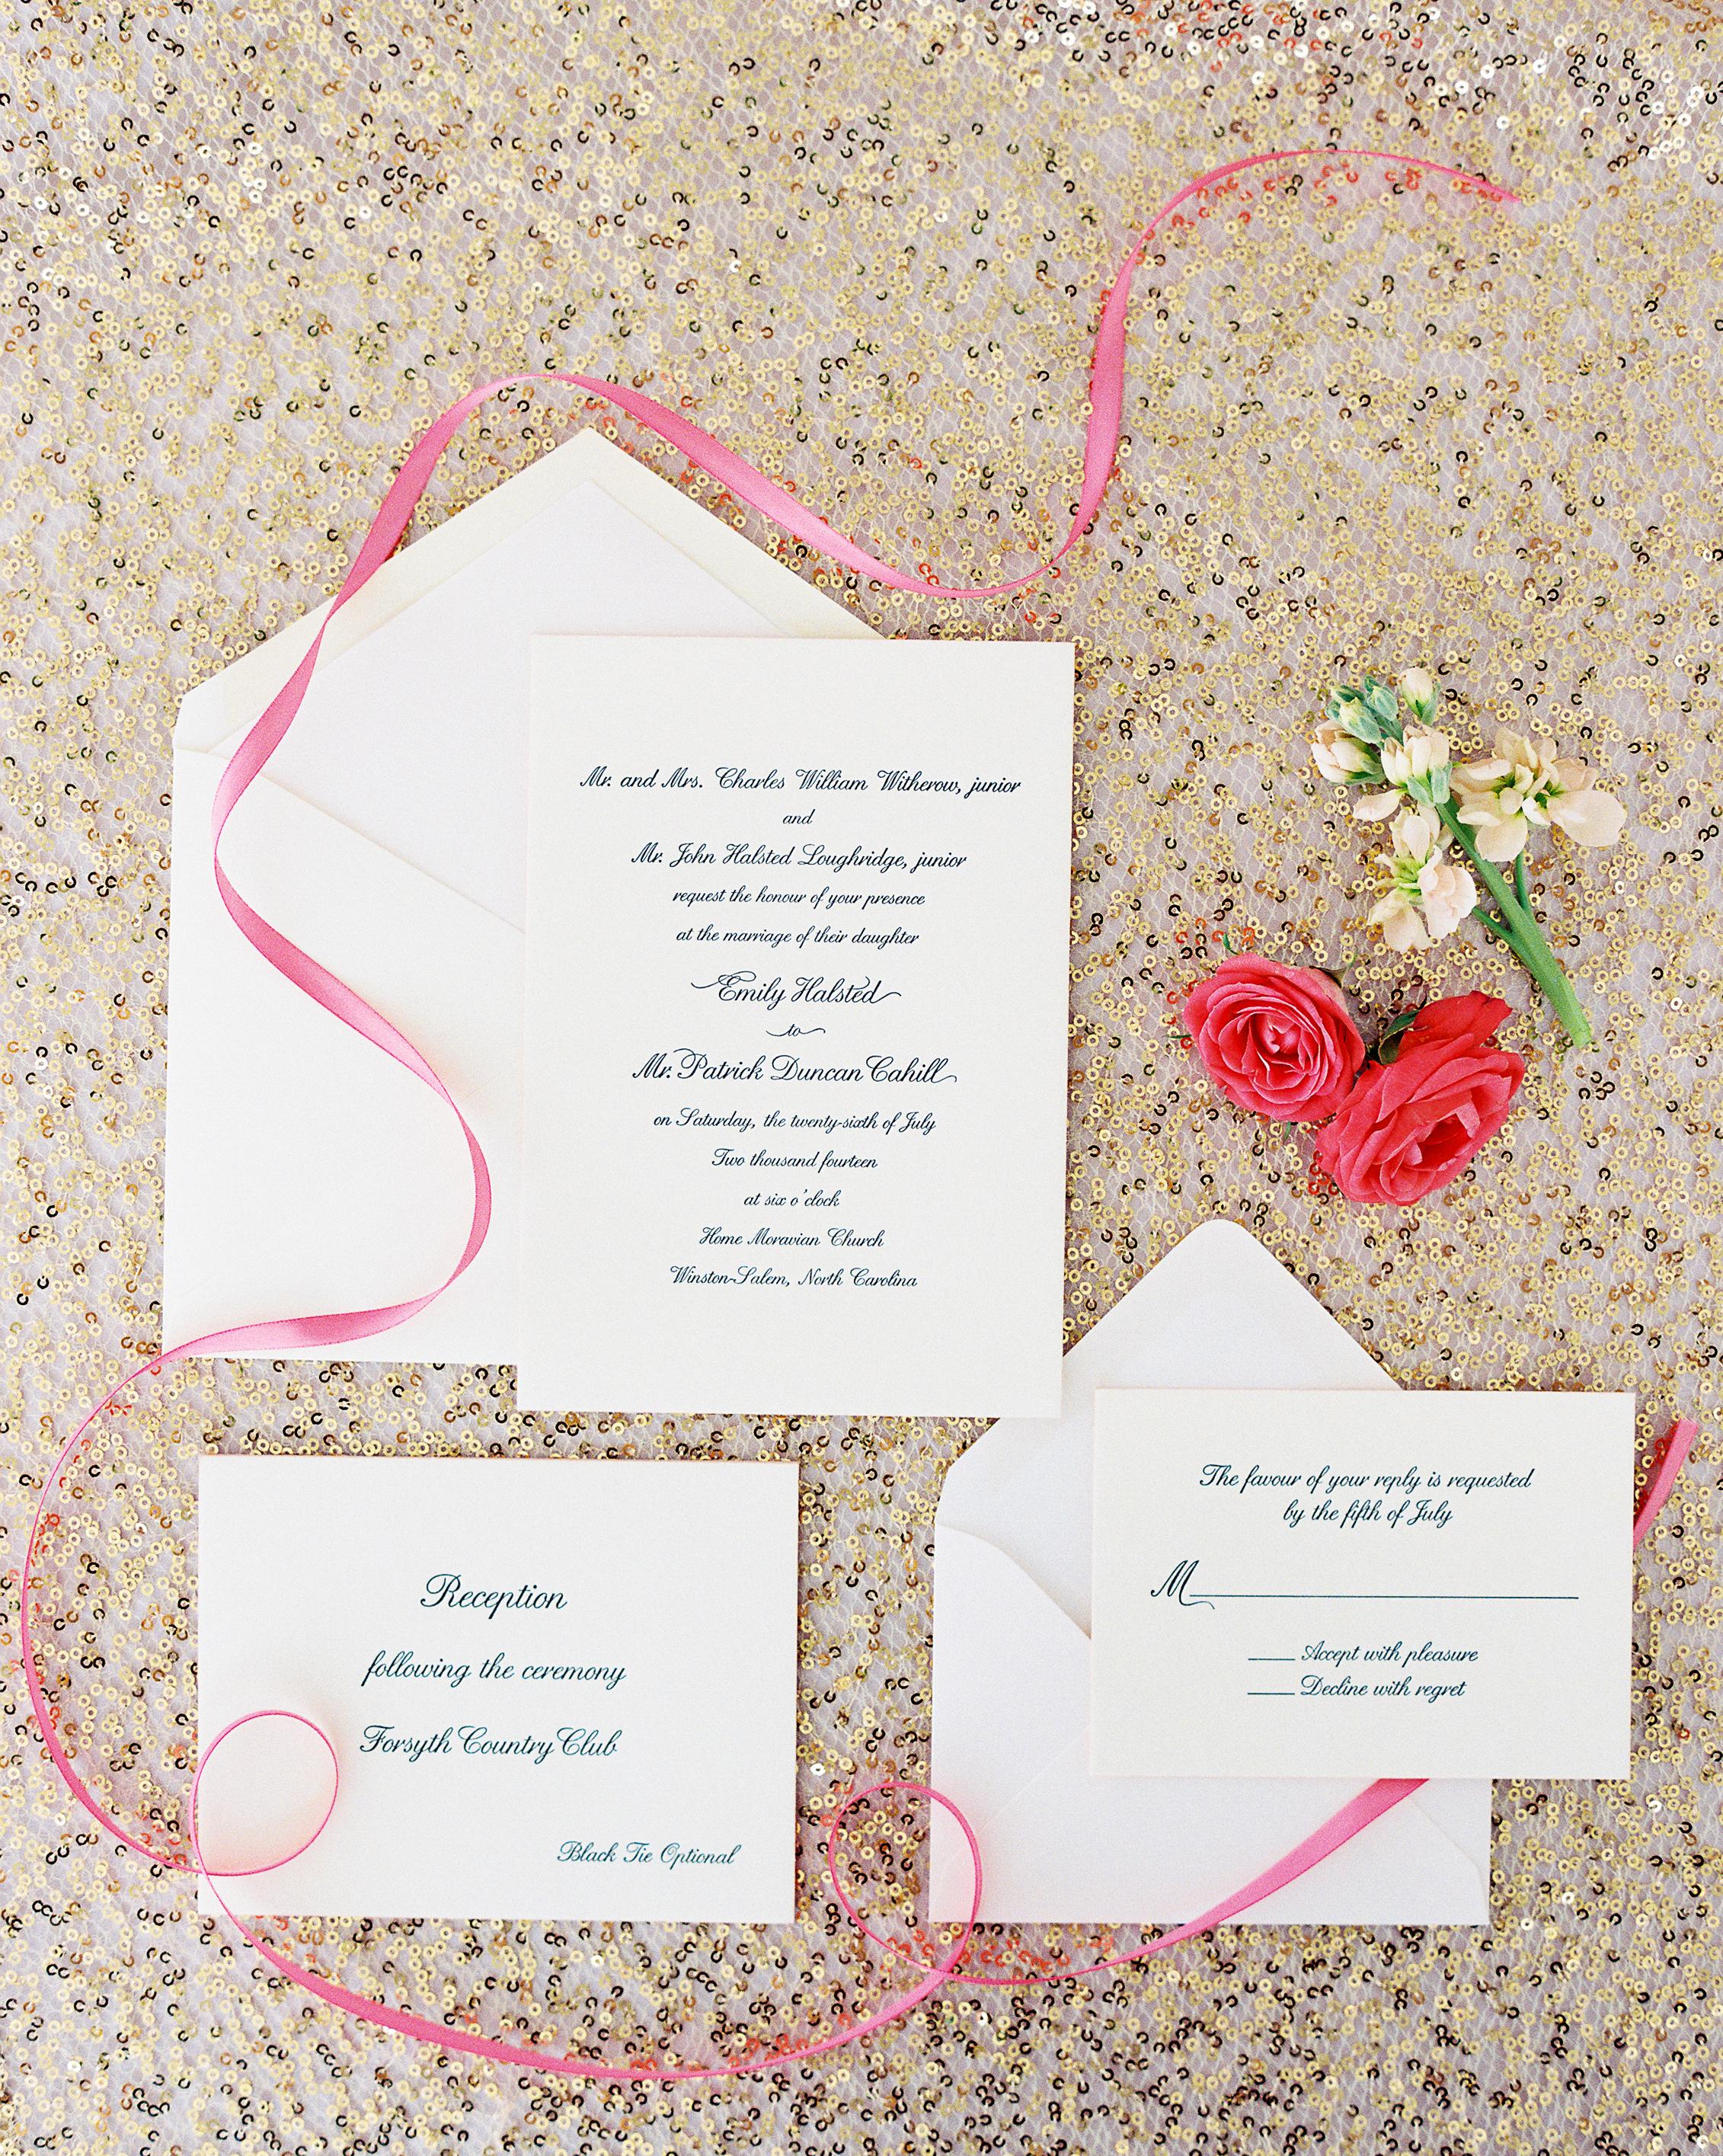 molly-patrick-wedding-invite-3037-s111760-0115.jpg